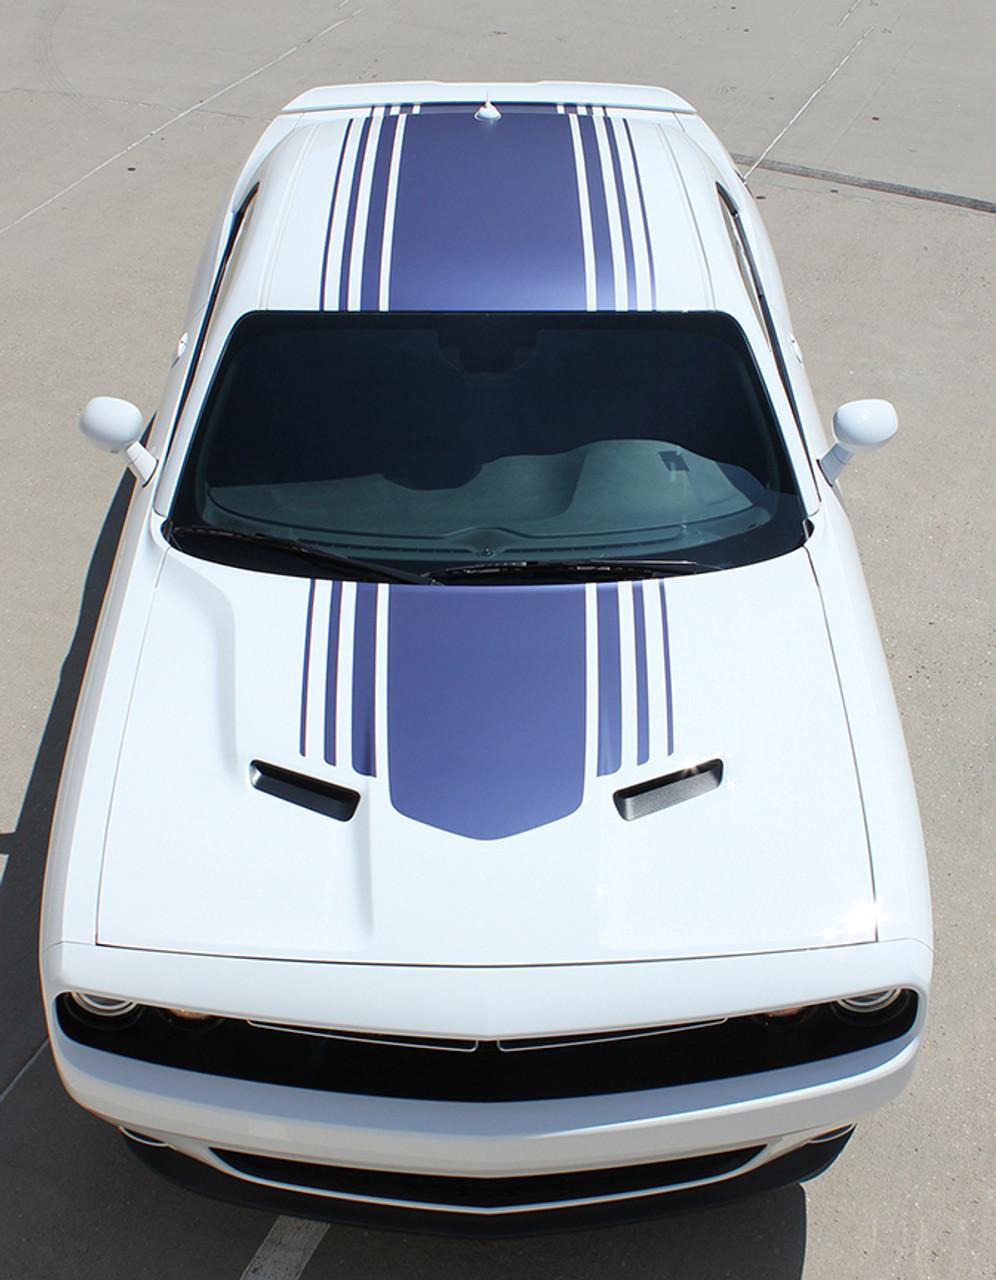 Dodge Challenger Hood T Stripes Graphics 2008 2009 2010 2011 2012 2013 2014 #3